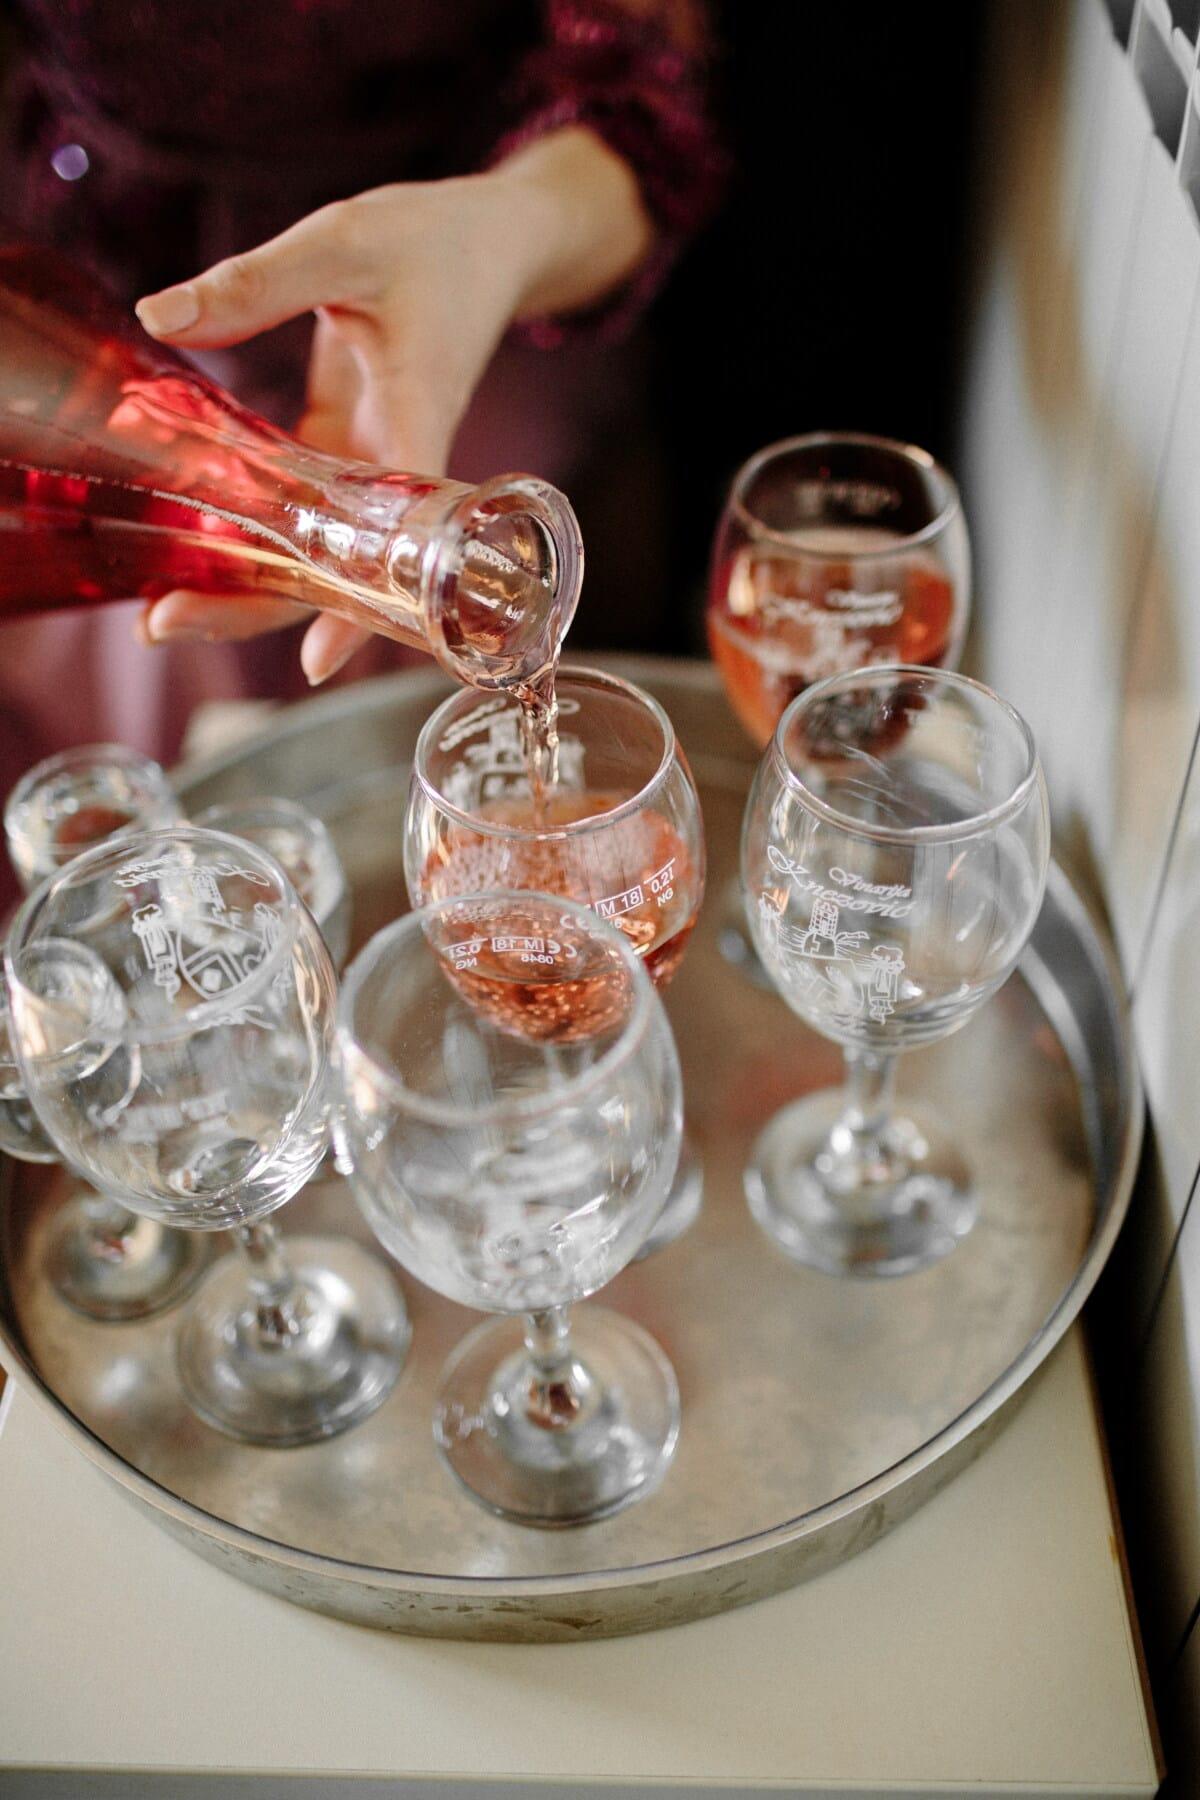 bottle, vintage, red wine, crystal, glass, wine, beverage, drink, alcohol, party